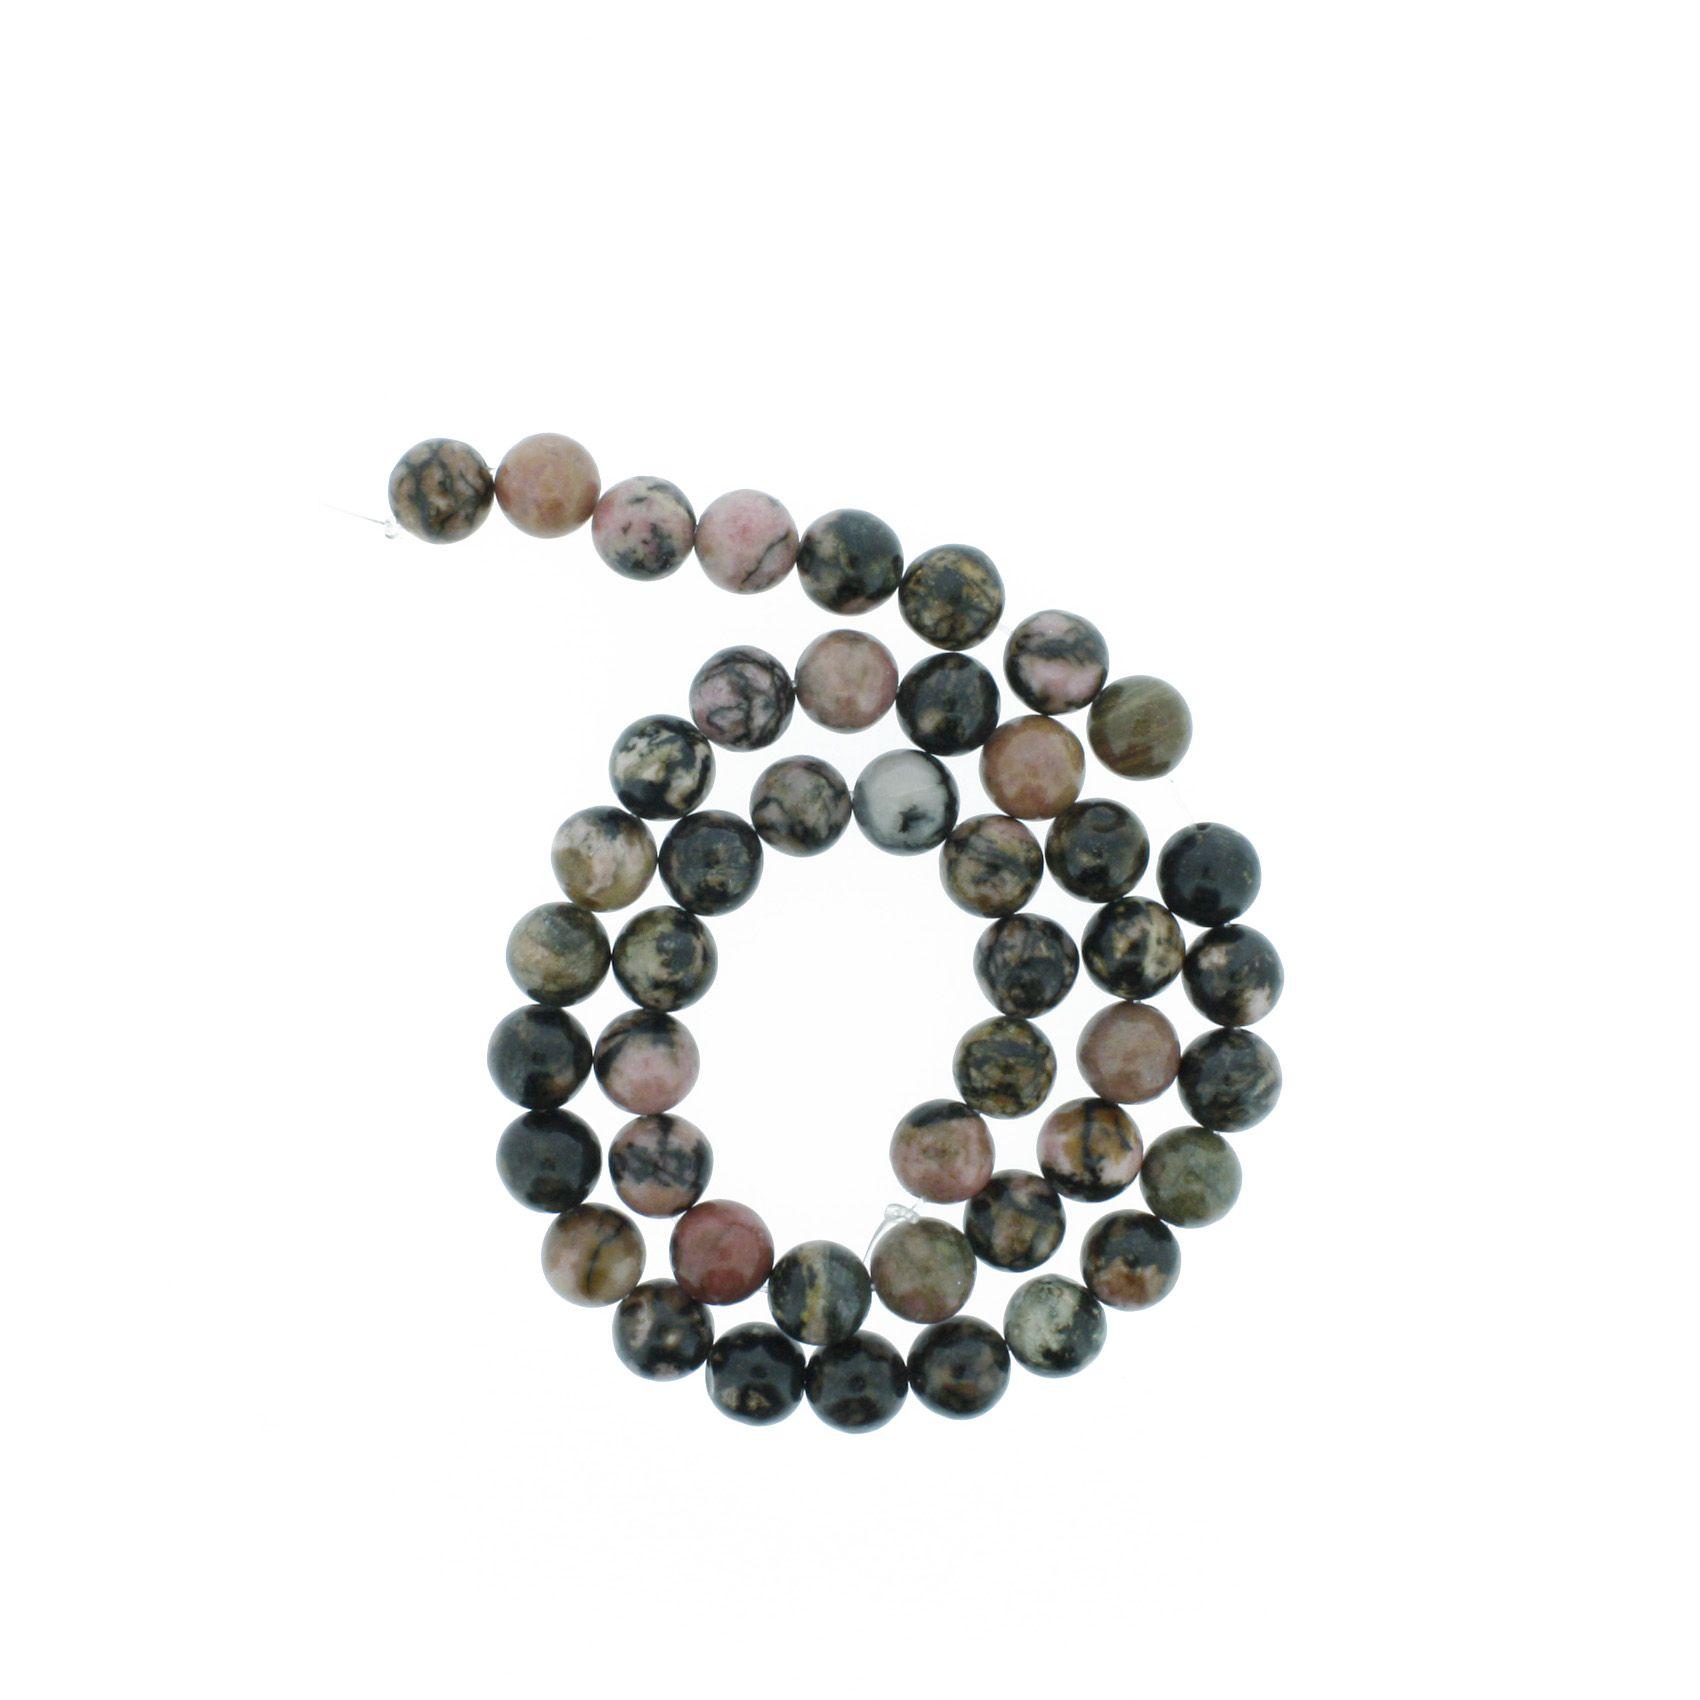 Fio de Pedra - Rodonita - 8mm  - Stéphanie Bijoux® - Peças para Bijuterias e Artesanato